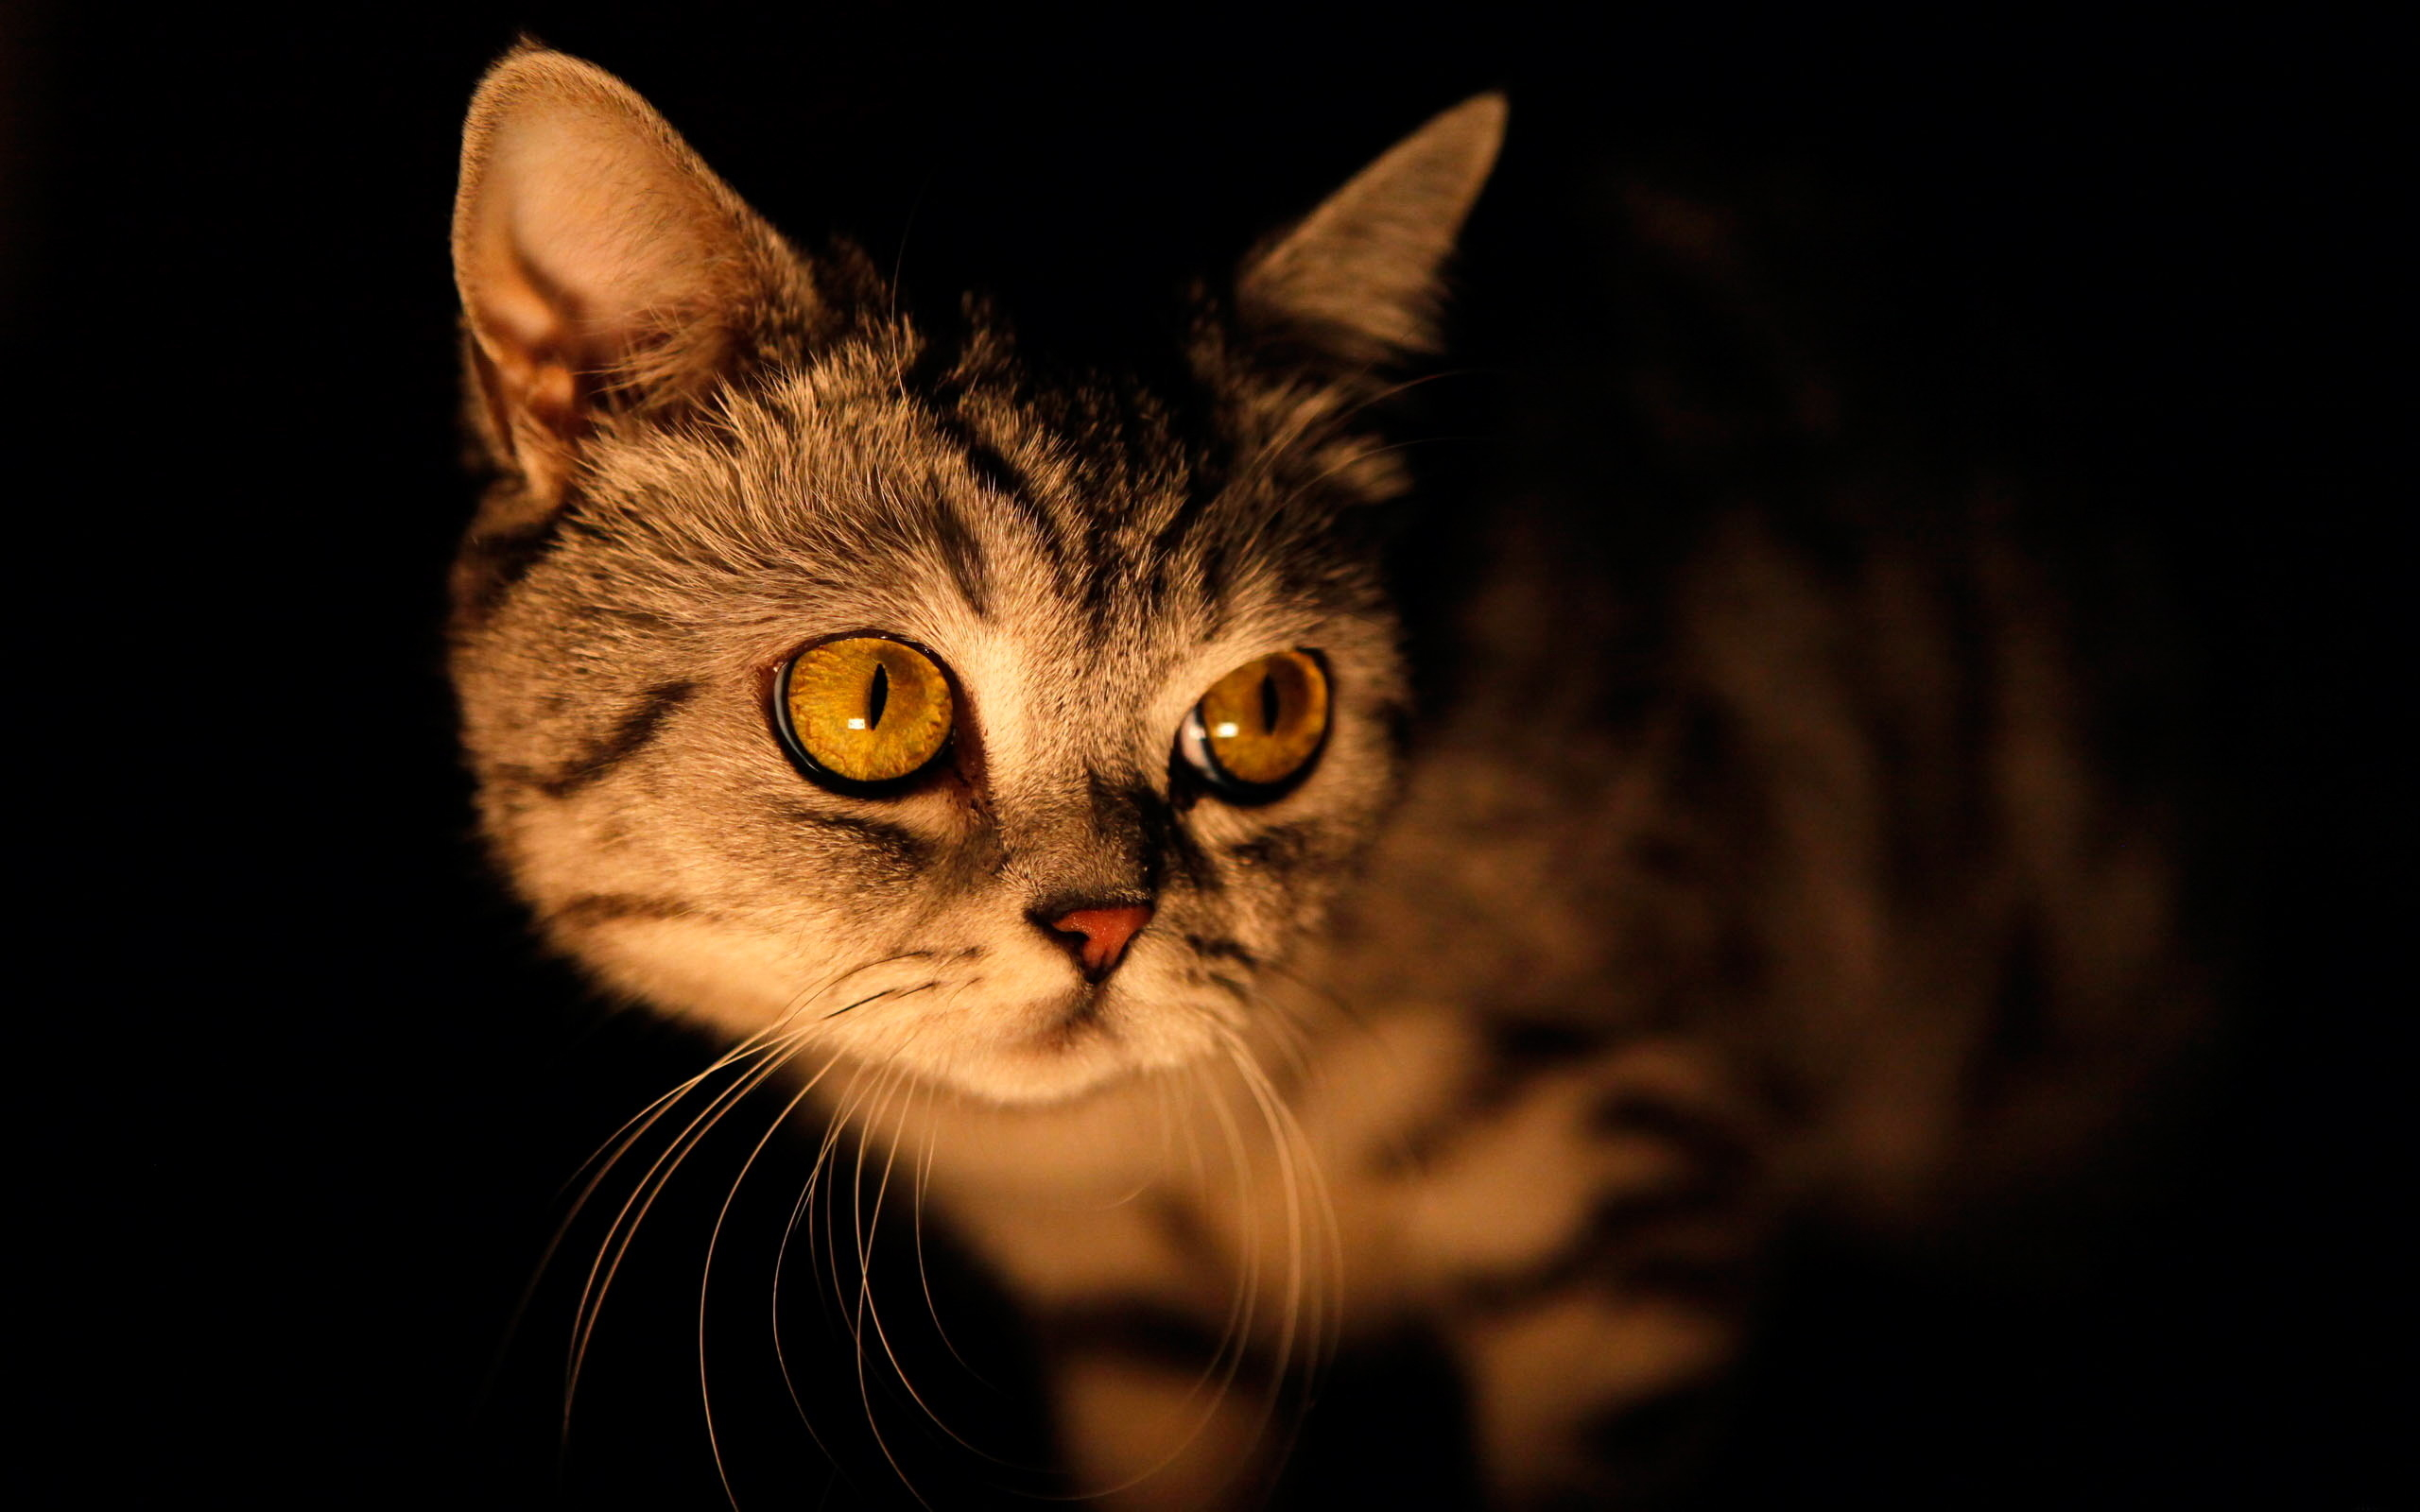 луна кот обои на рабочий стол № 573637 бесплатно